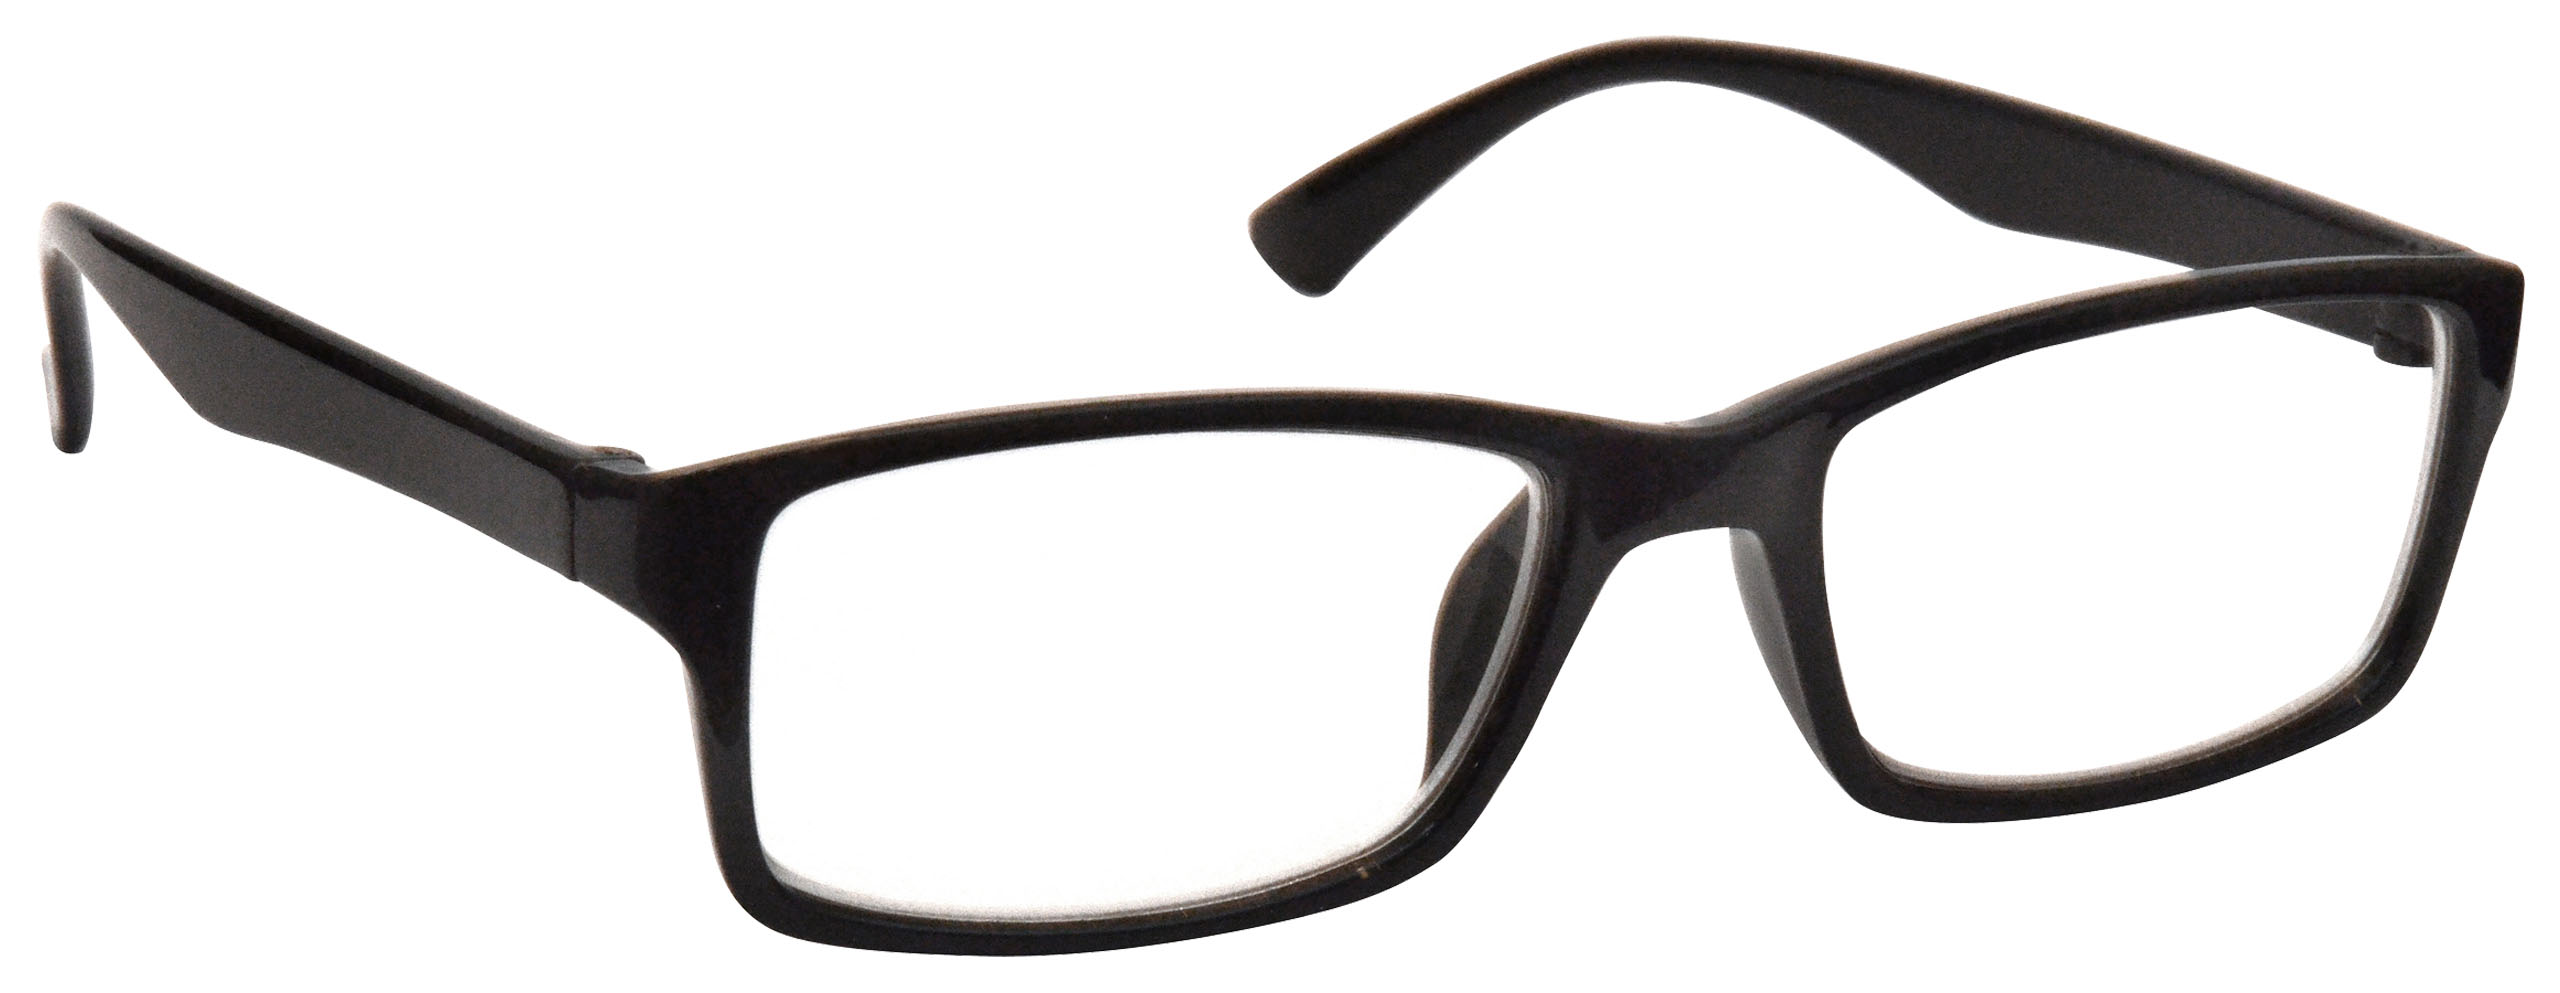 34d98296a0d Reading Glasses Ebay Reading Glasses - Bitterroot Public Library